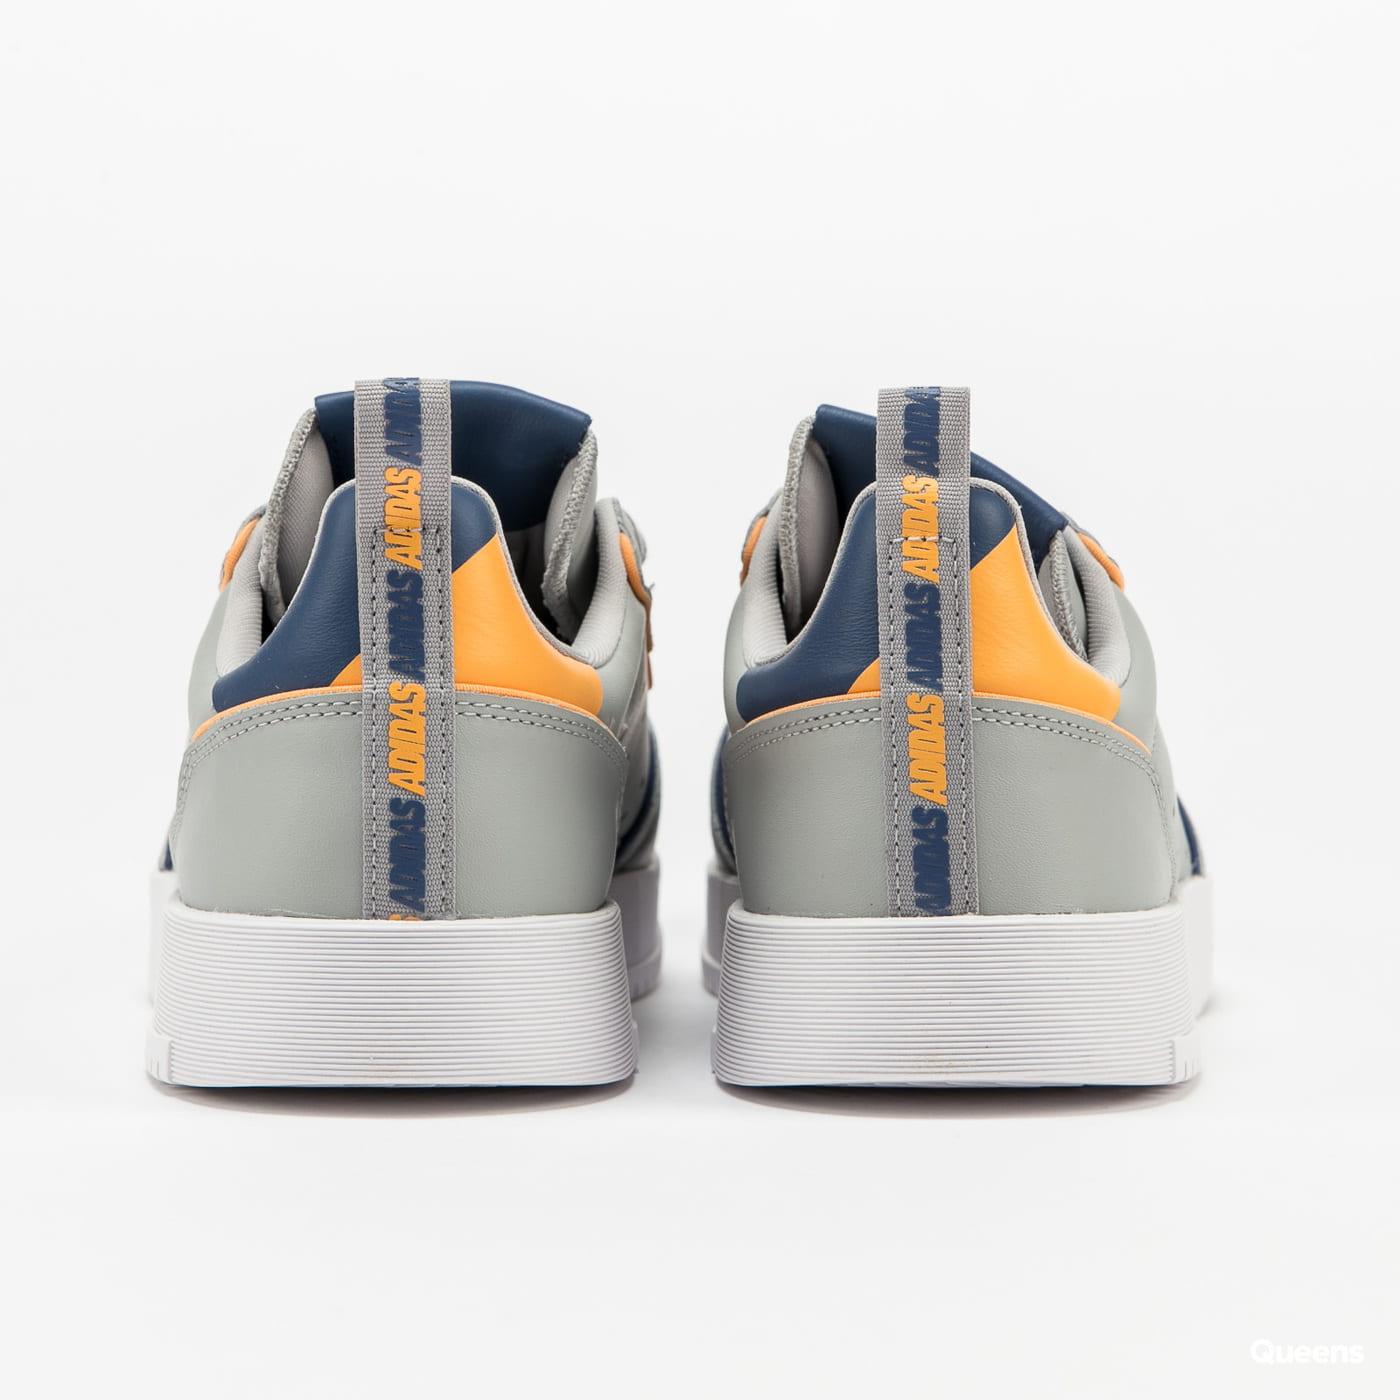 adidas Originals Supercourt gretwo / ftwwht / creblu